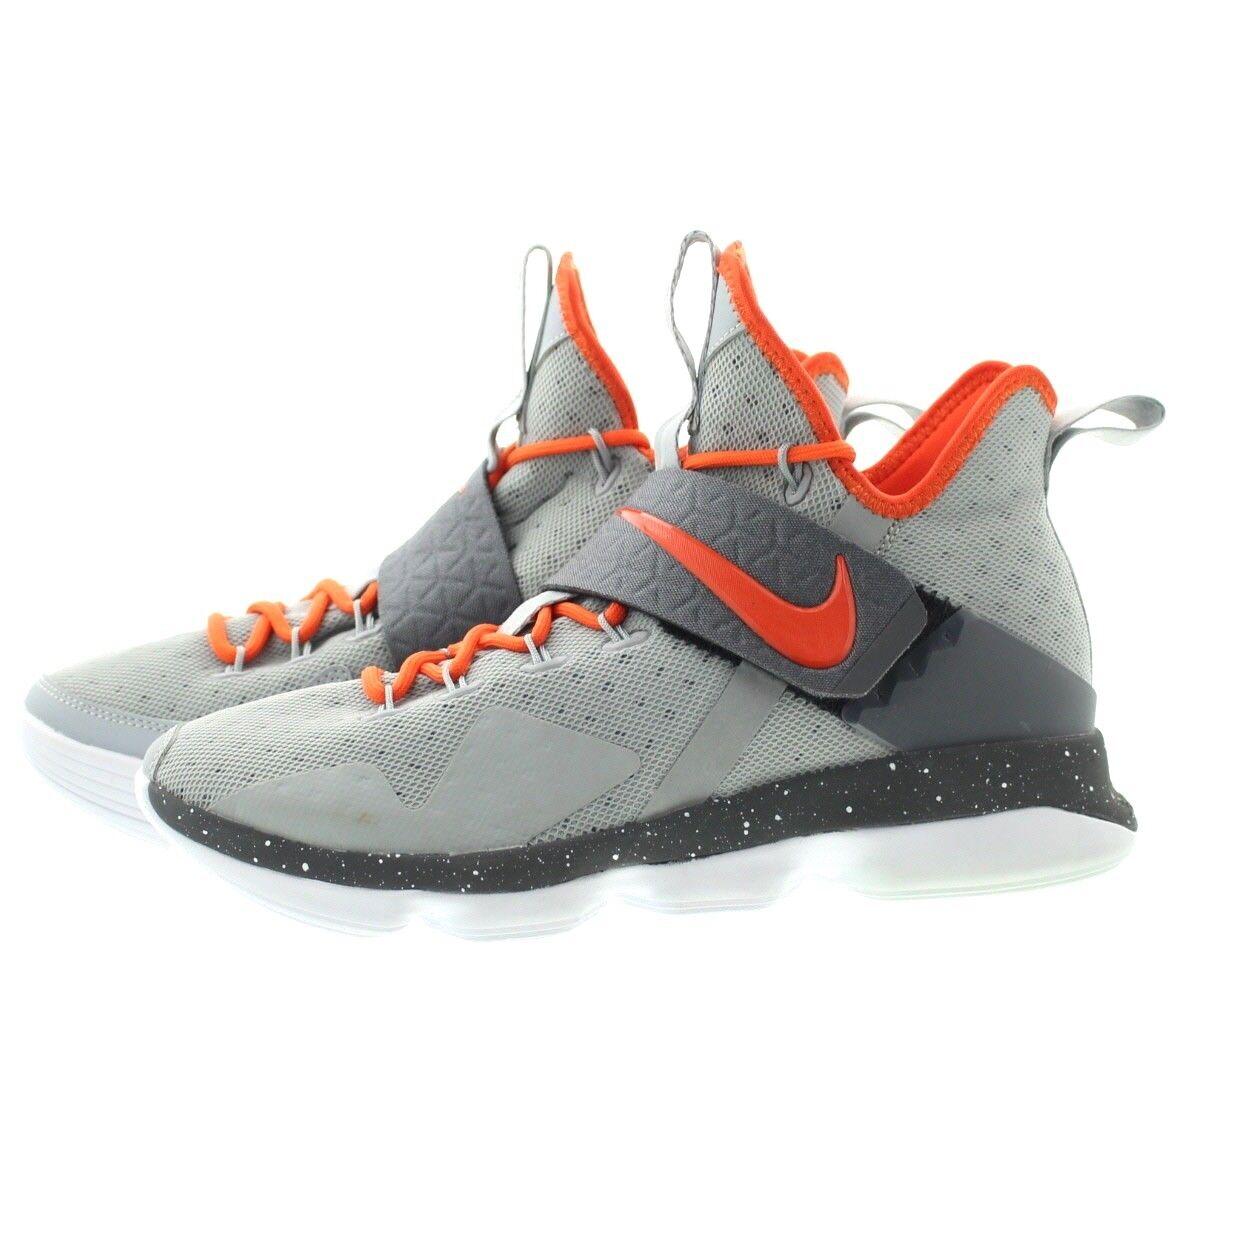 Nike 926720 991 Mens Lebron XIV 14 iD Performance Basketball shoes Sneakers